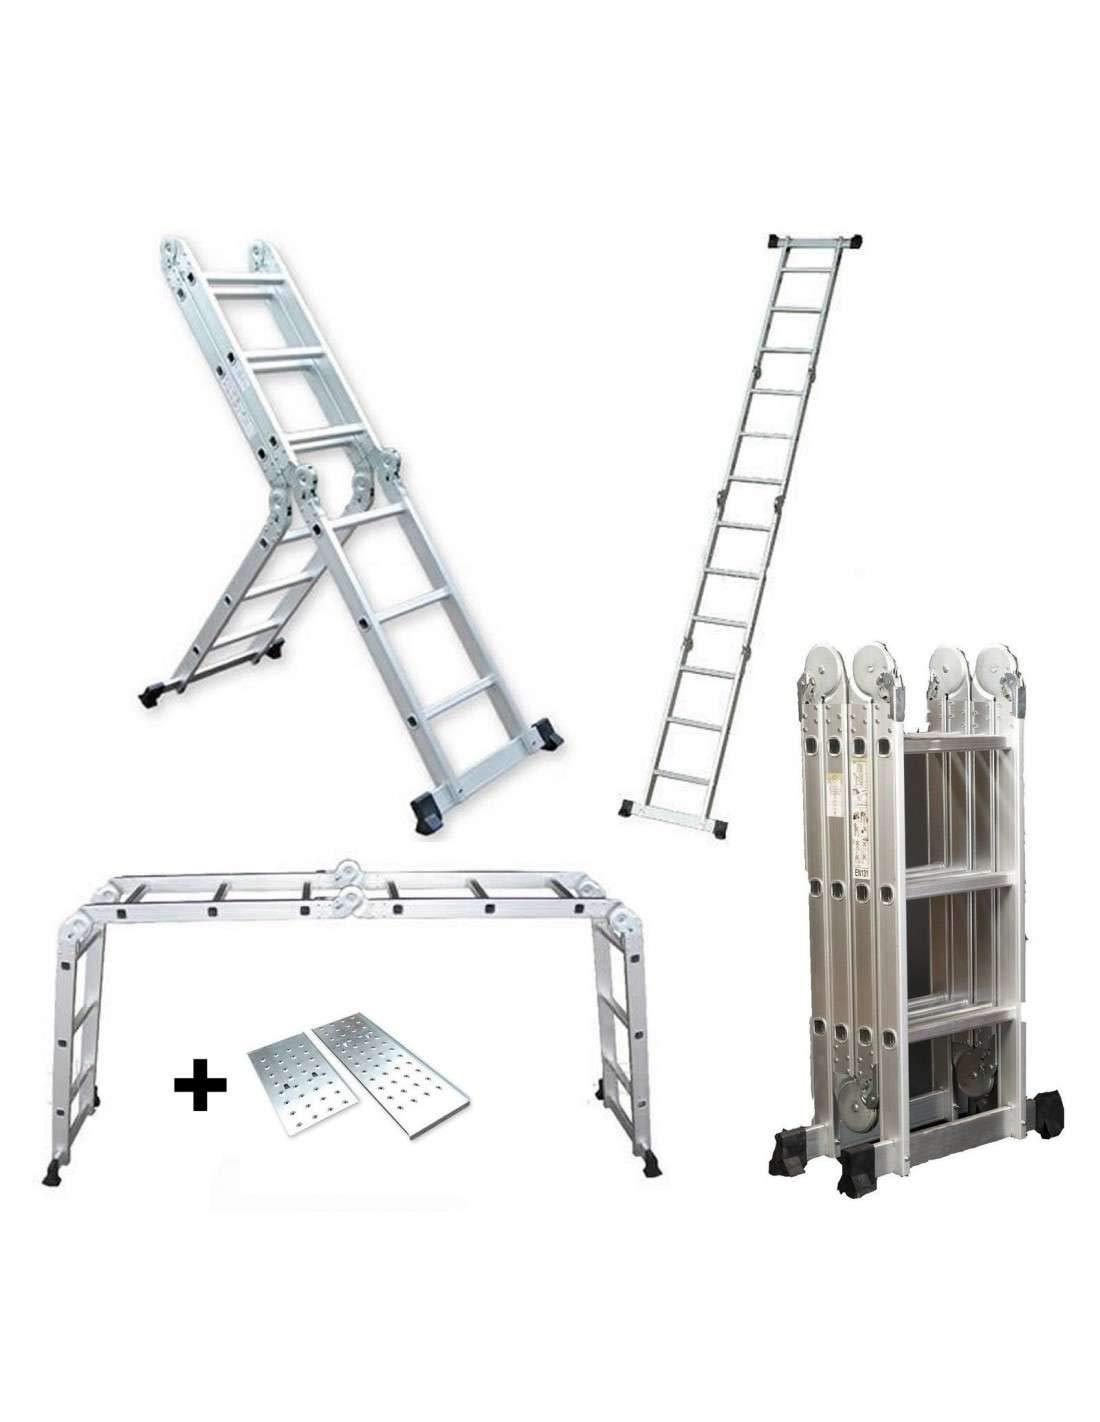 Escalera Multifunci/ón de aluminio 5,75M Plegable 6 en 1 Multiuso con Plataforma AG//DLM-105-PL Grandmaster